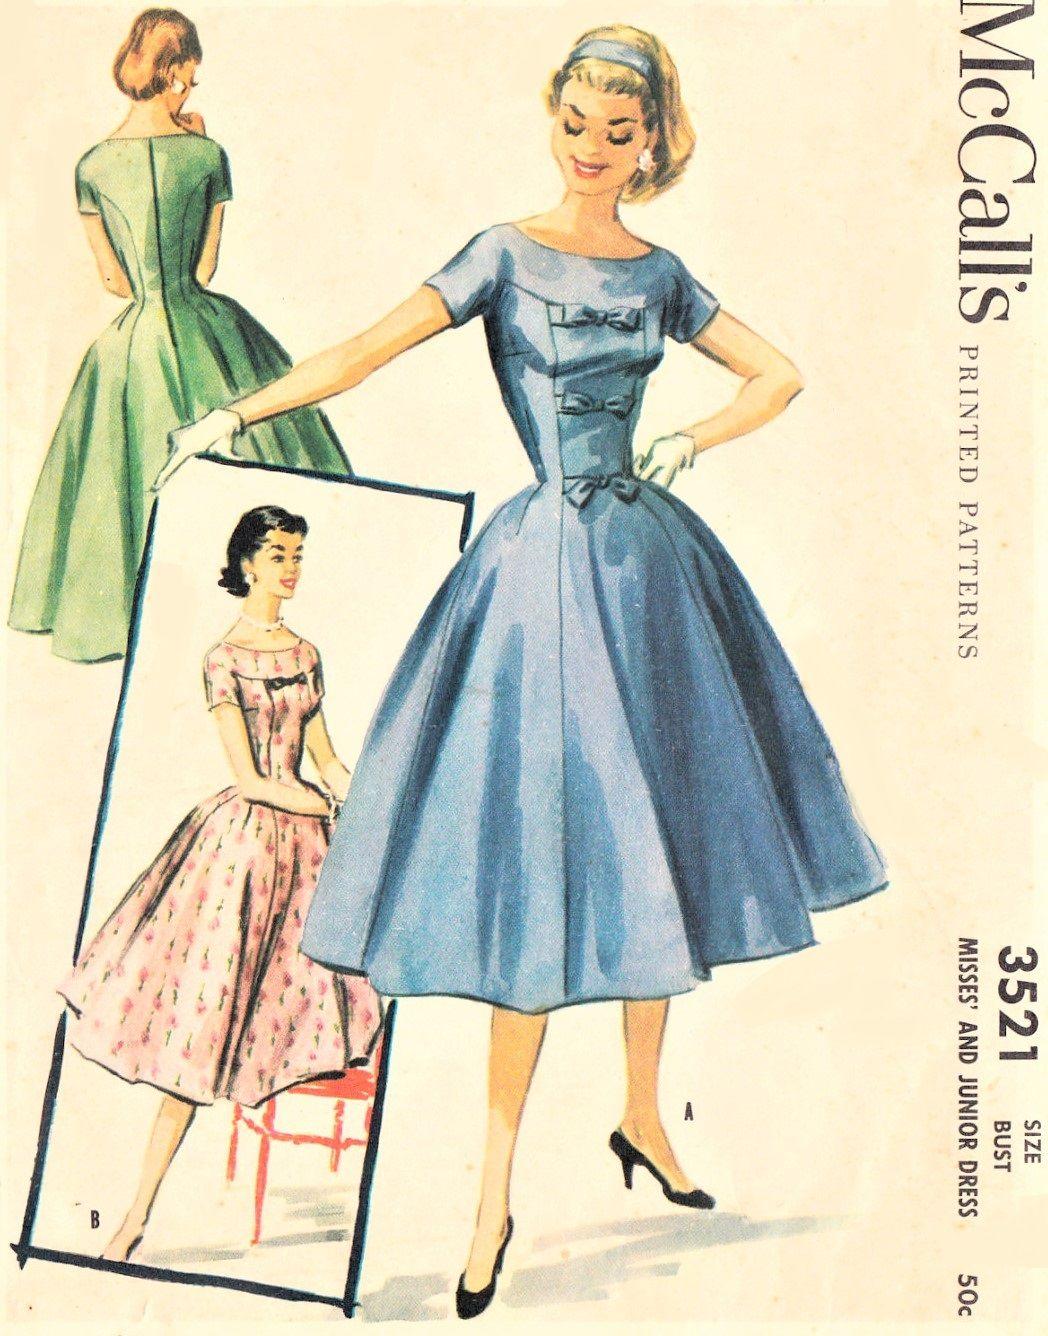 1950s Lovely Daytime Or Party Cocktail Dress Pattern Mccalls 3521 Figure Flattering Full Vintage Dress Patterns Cocktail Dress Patterns Mccalls Patterns Dress [ 1336 x 1048 Pixel ]